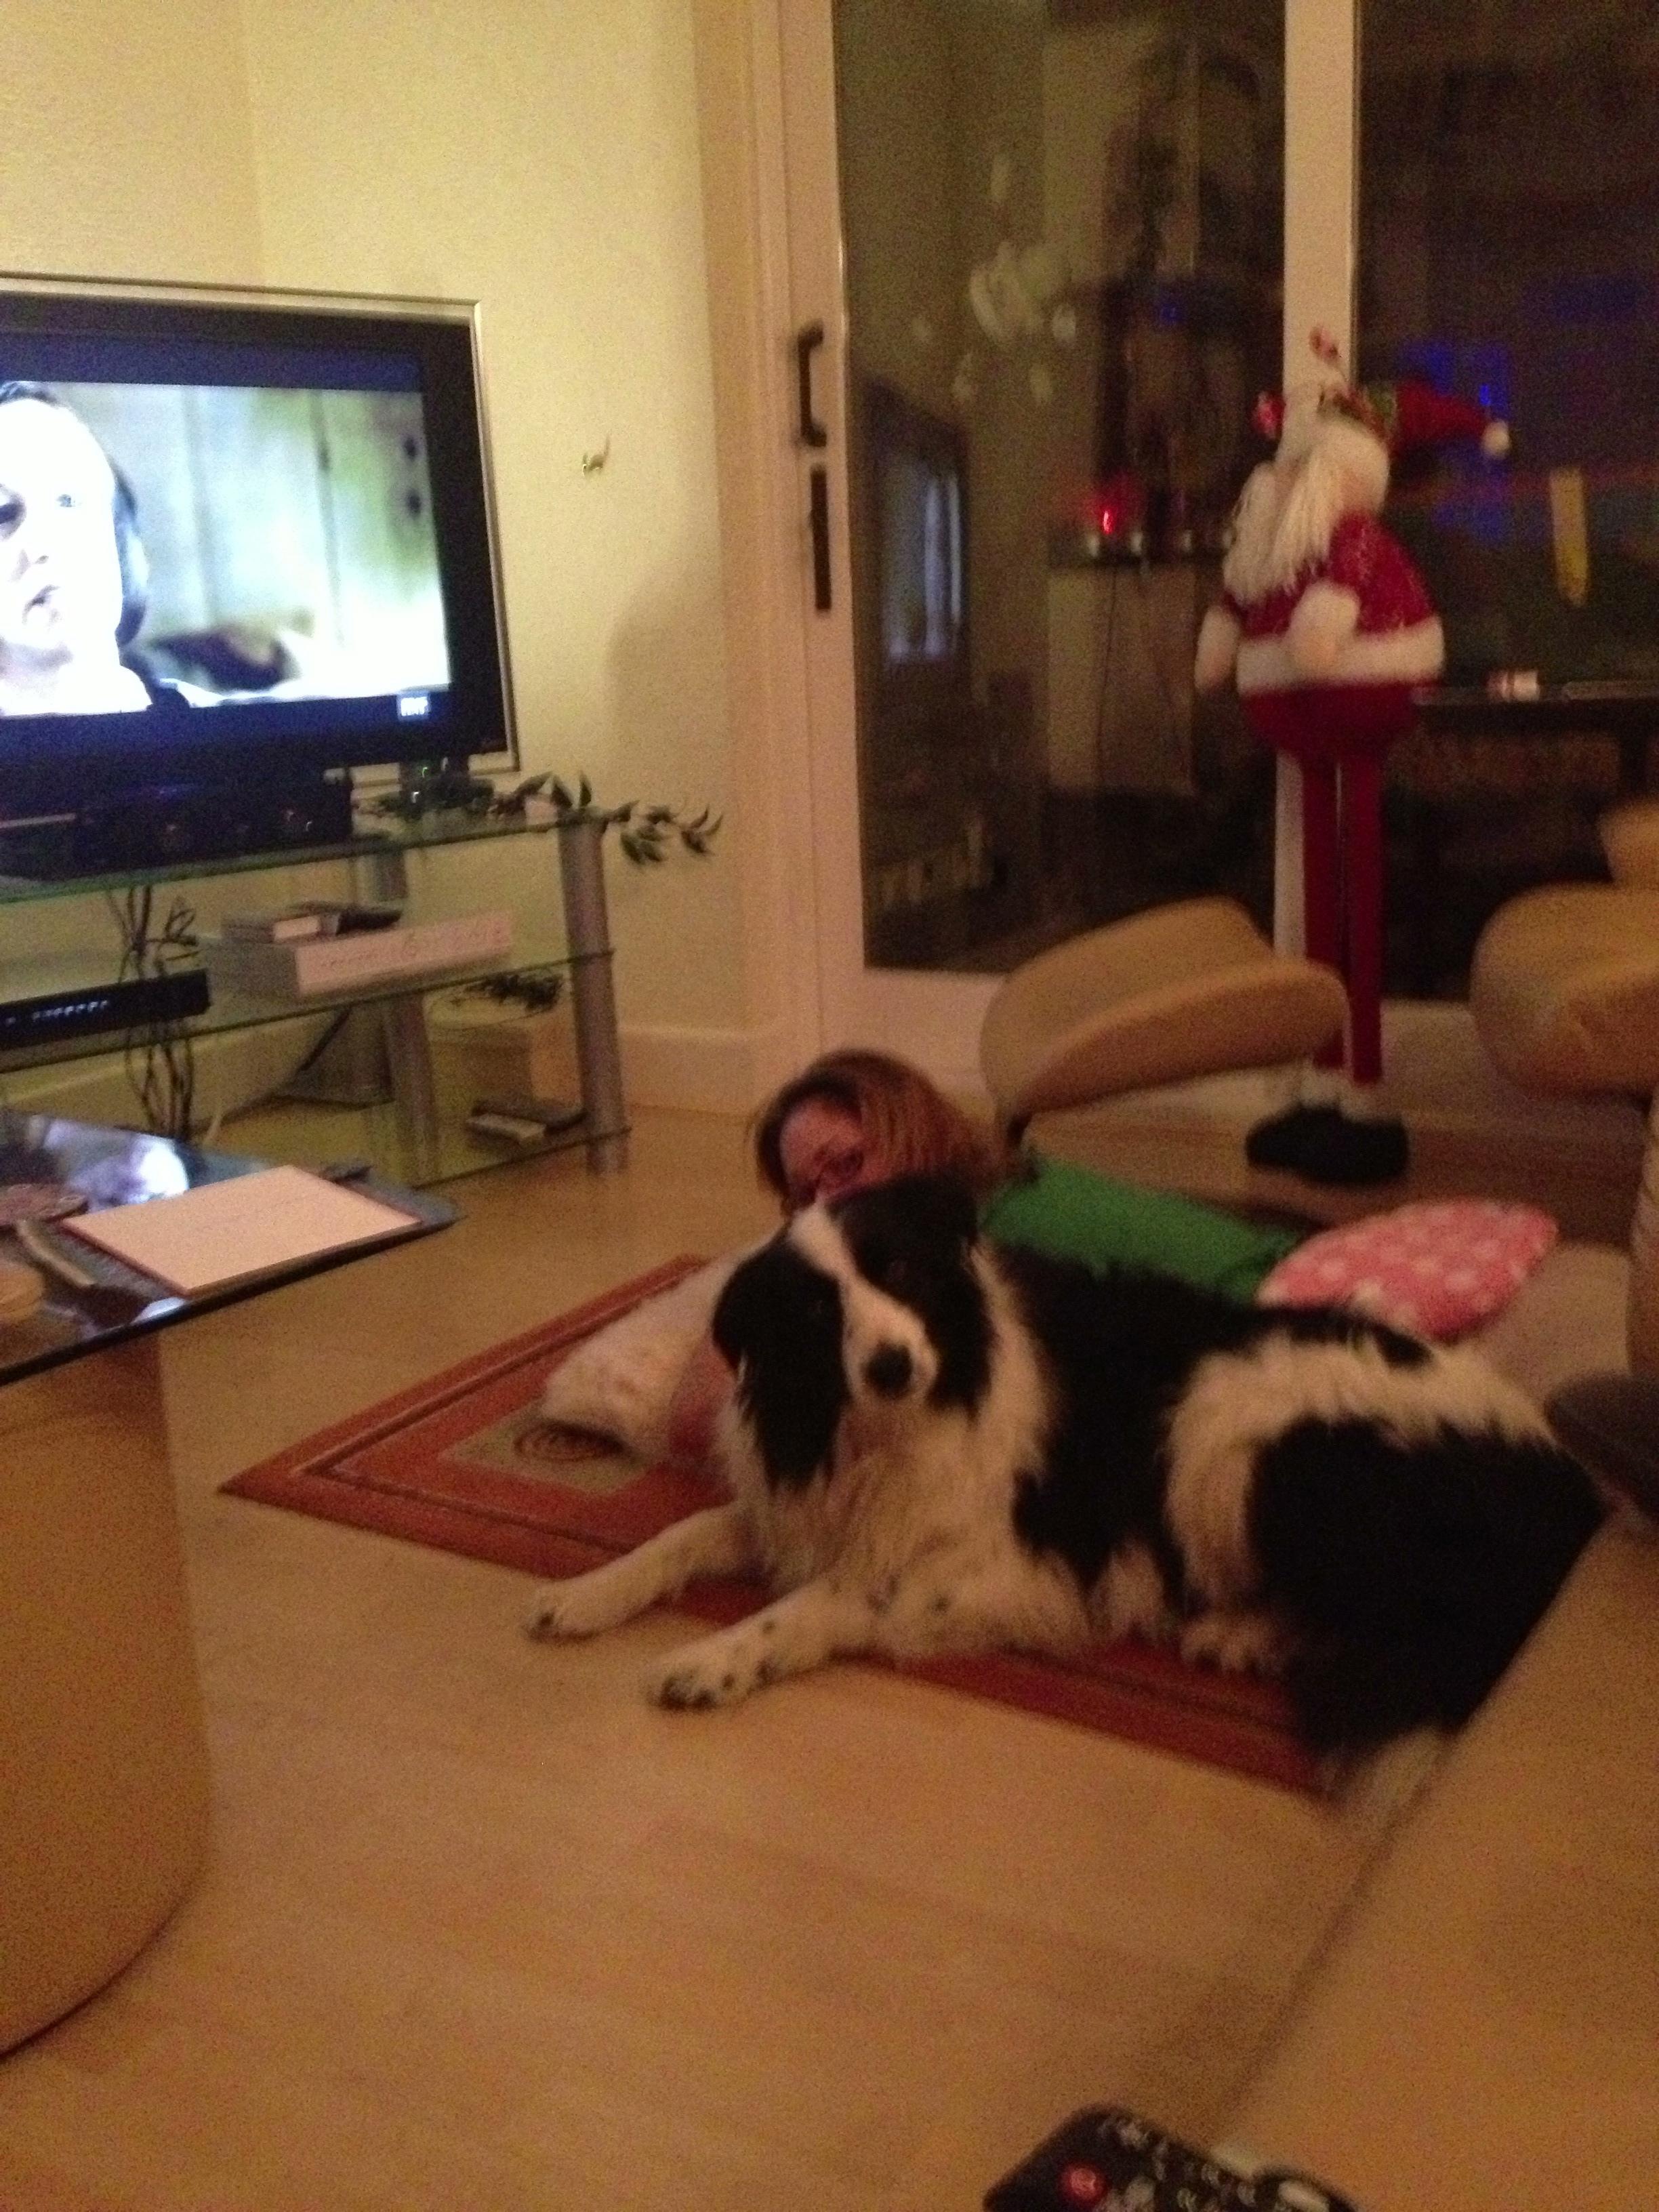 Tiga and I watching Tv